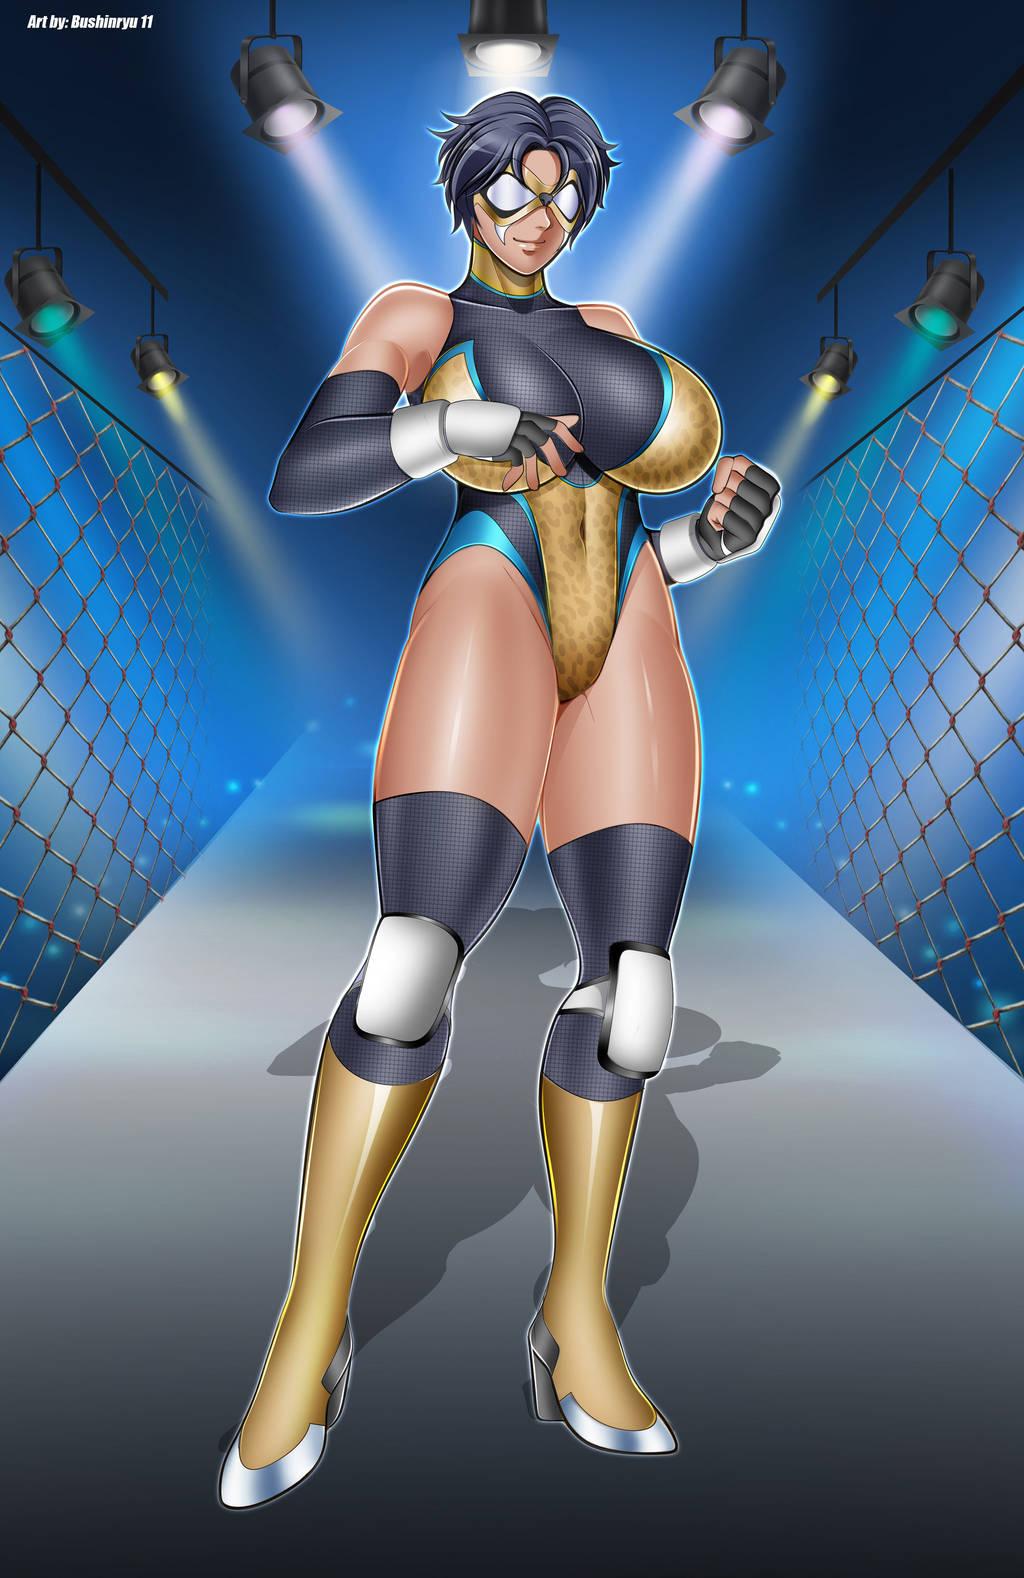 Tigress Kara Wrestler_fighter__golden_tiger_by_bushinryu11_dcuhmcg-fullview